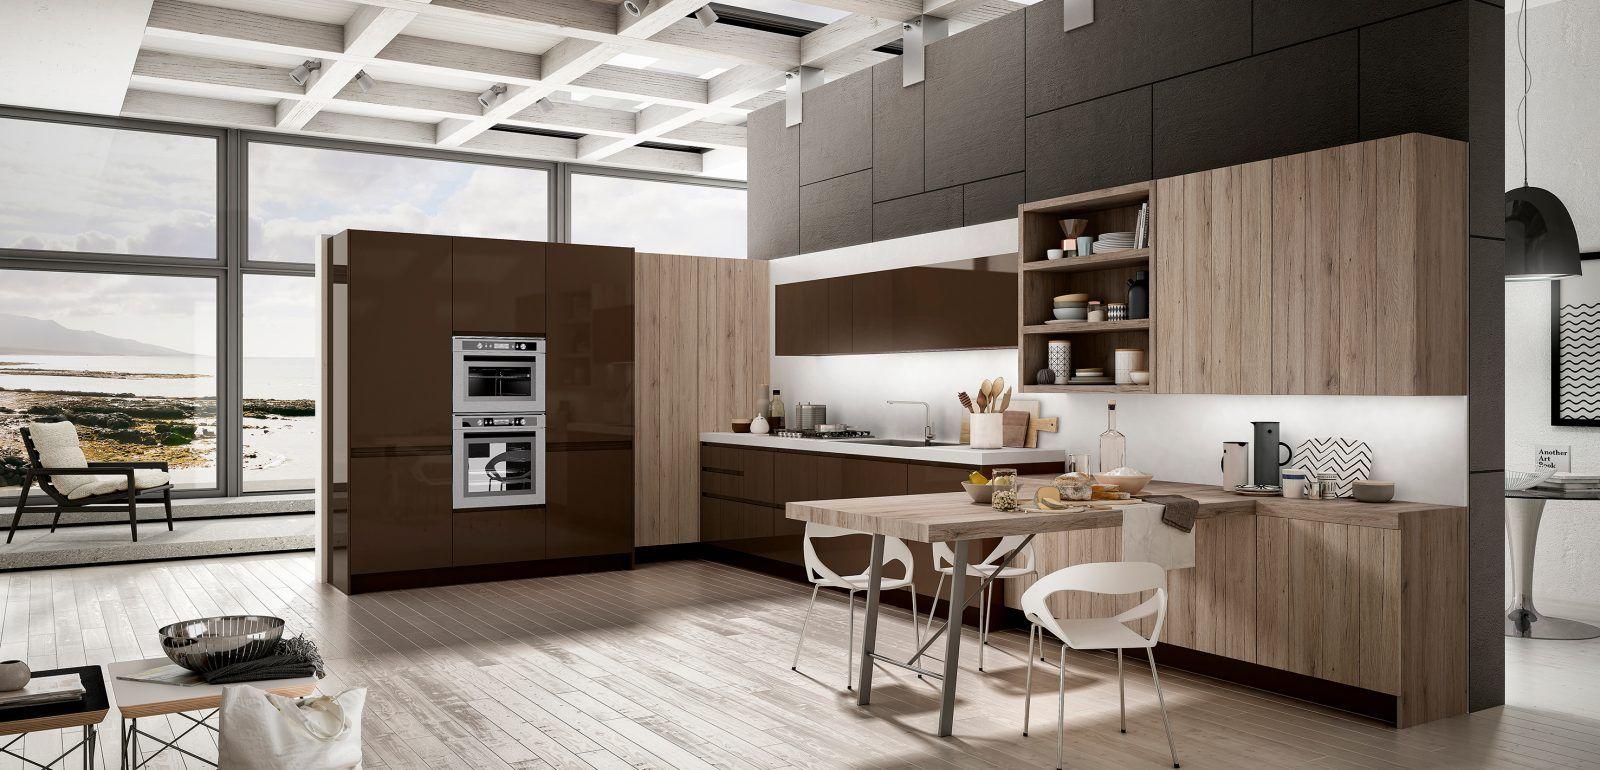 Penisola Cucina In Muratura cucina moderna ad angolo con isola